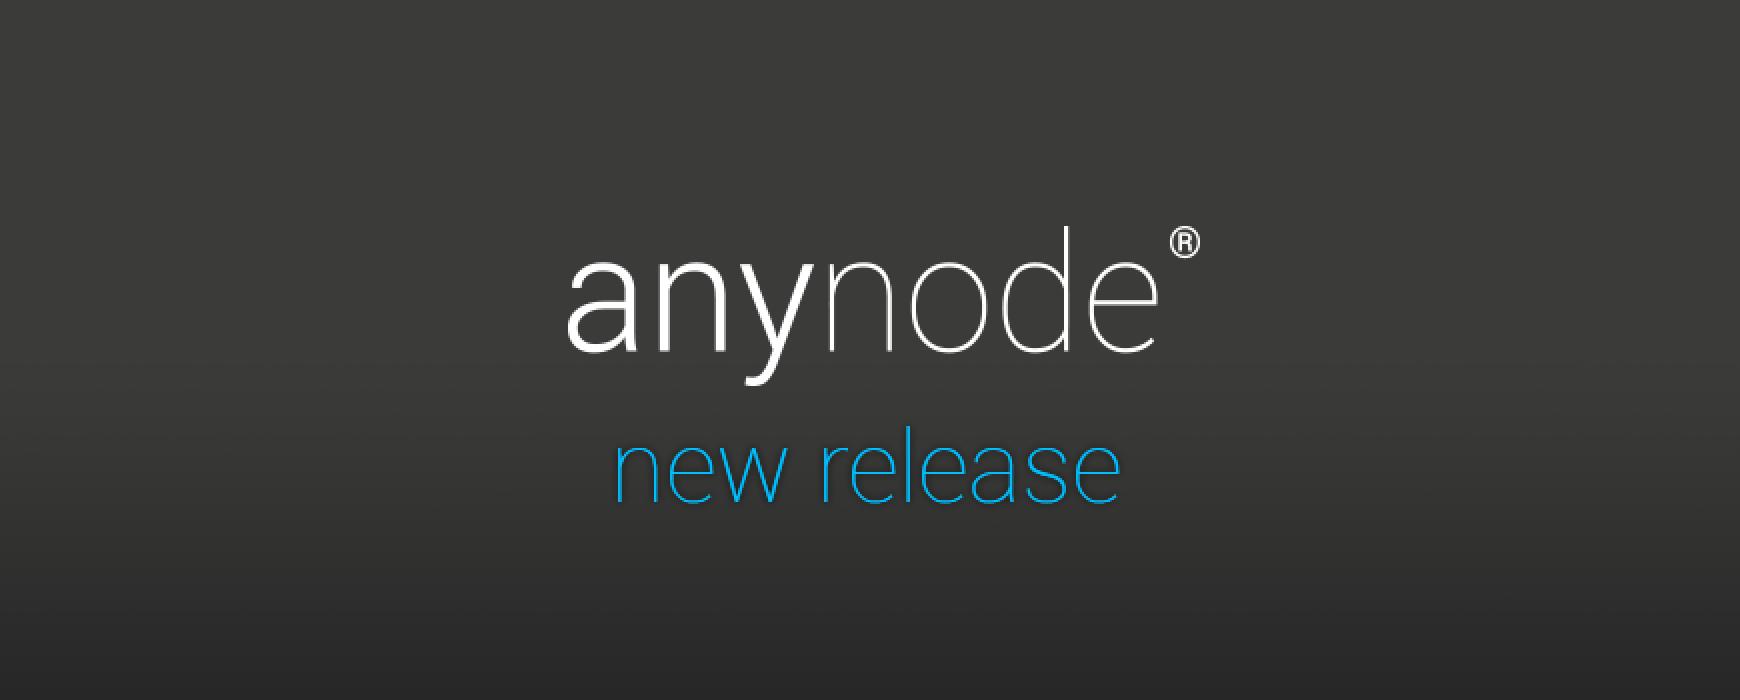 Wake up: anynode 3.0 is here!